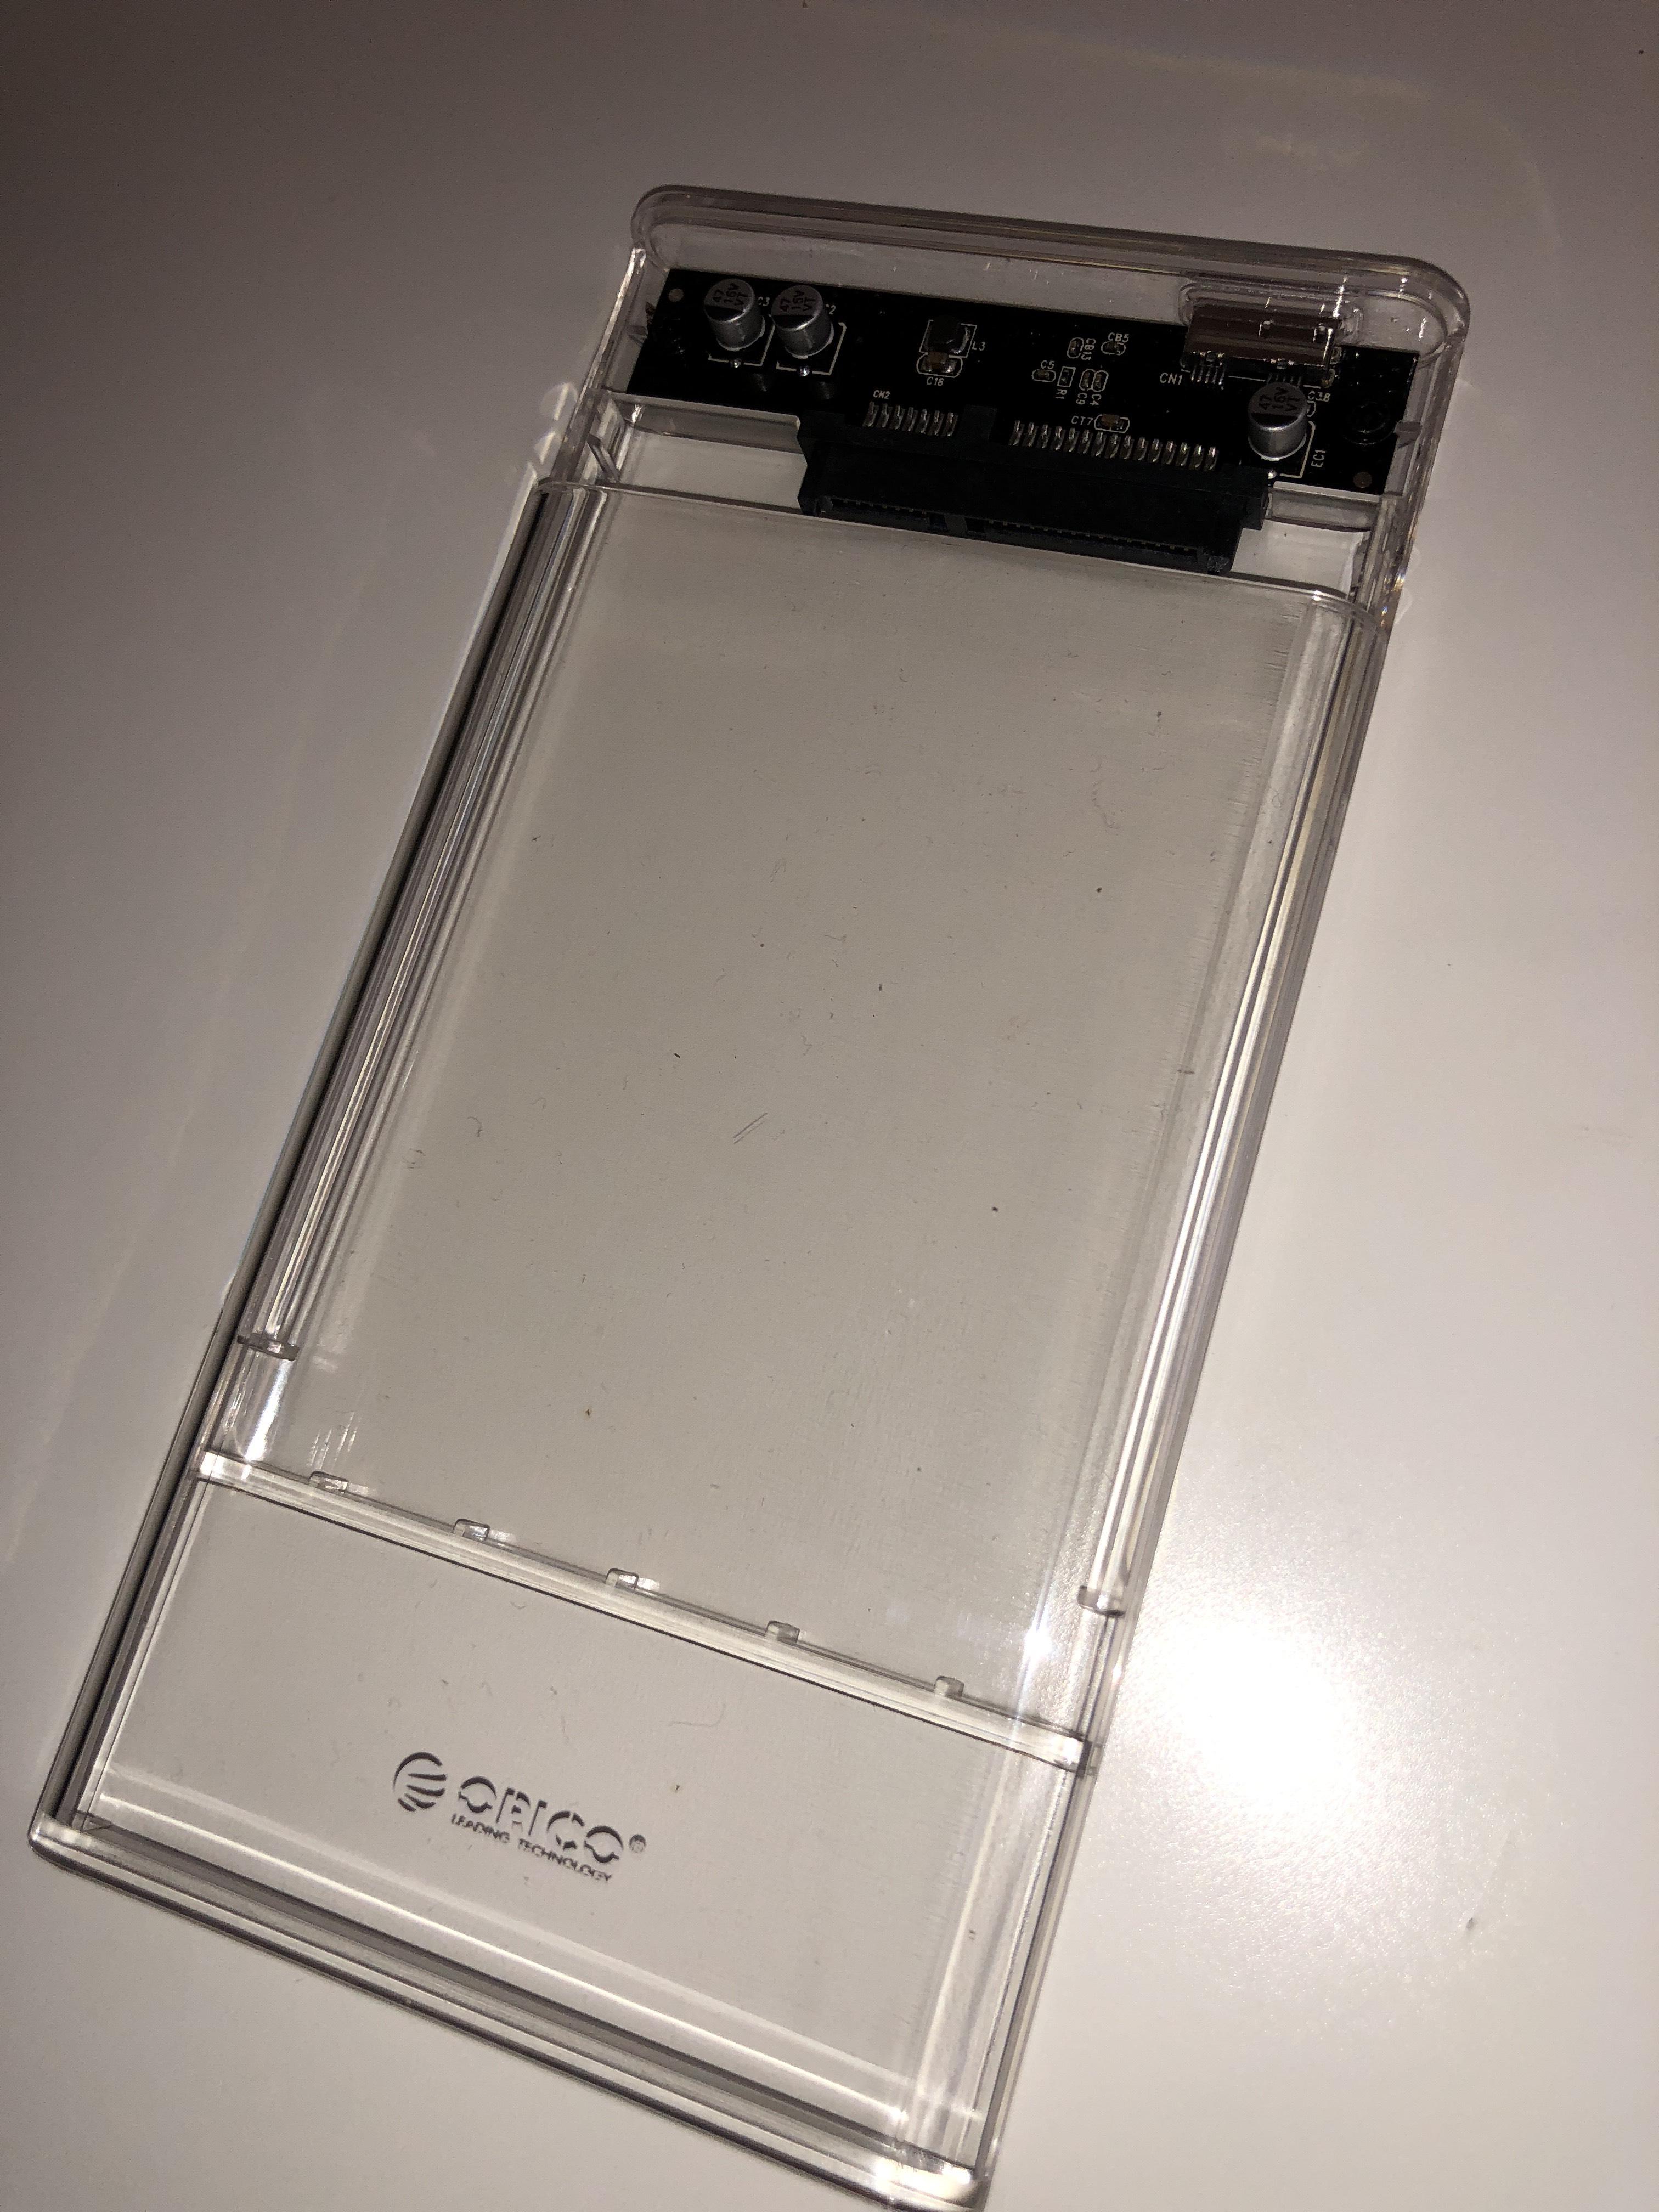 17838505-F8P9b.jpg